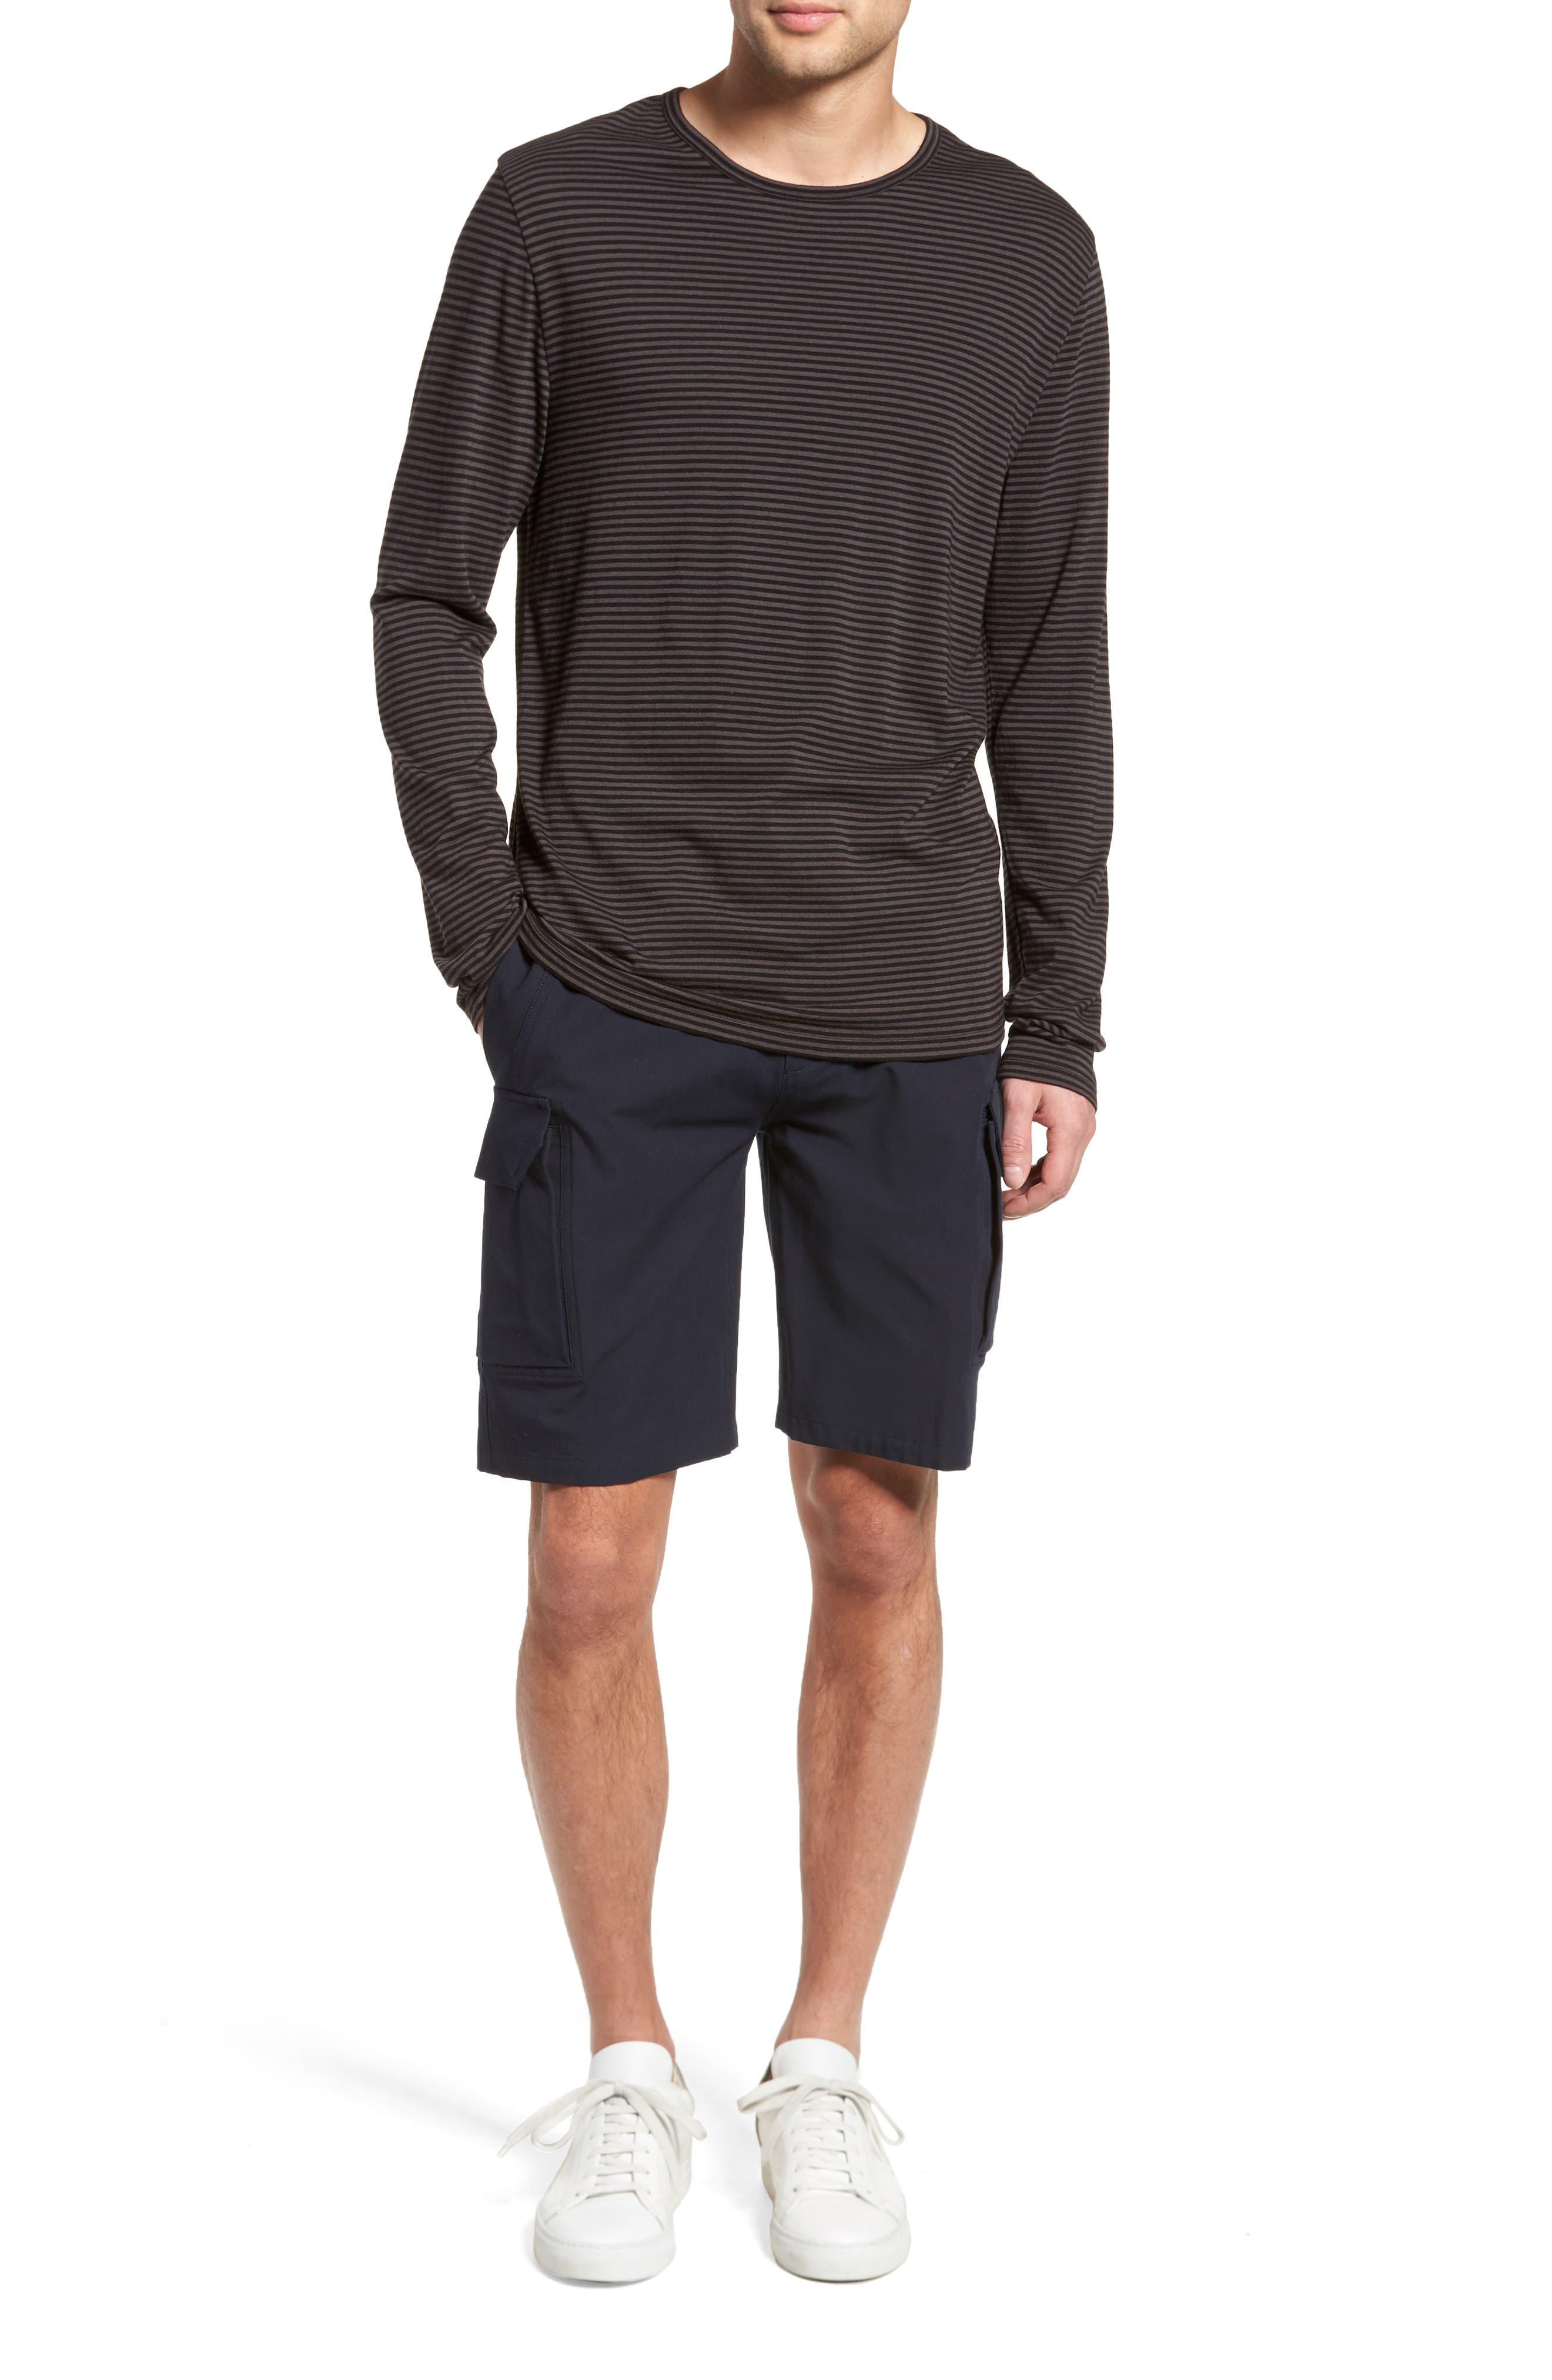 Feeder Stripe Long Sleeve Shirt,                             Alternate thumbnail 7, color,                             Black/ Stone Grey